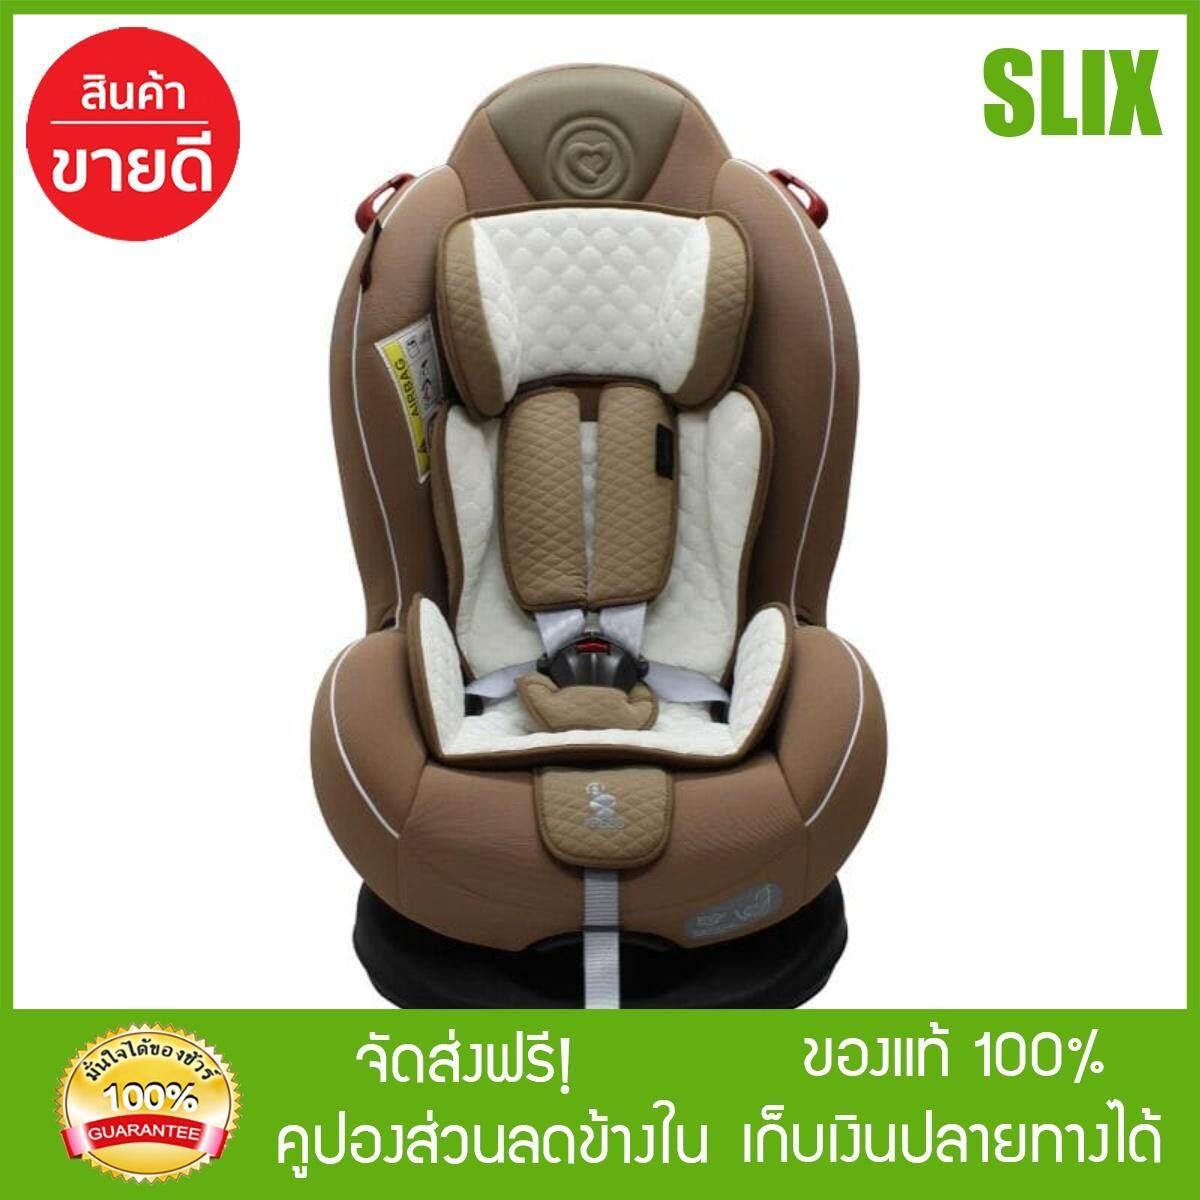 [Slix]- CAMERA เบาะติดรถผ้า+ccp กันศีรษะ bako-6 e รุ่น eco สีกาแฟ คาร์ซีท คาร์ซีทเด็ก คาร์ซีท camera car seat ส่ง Kerry เก็บปลายทางได้